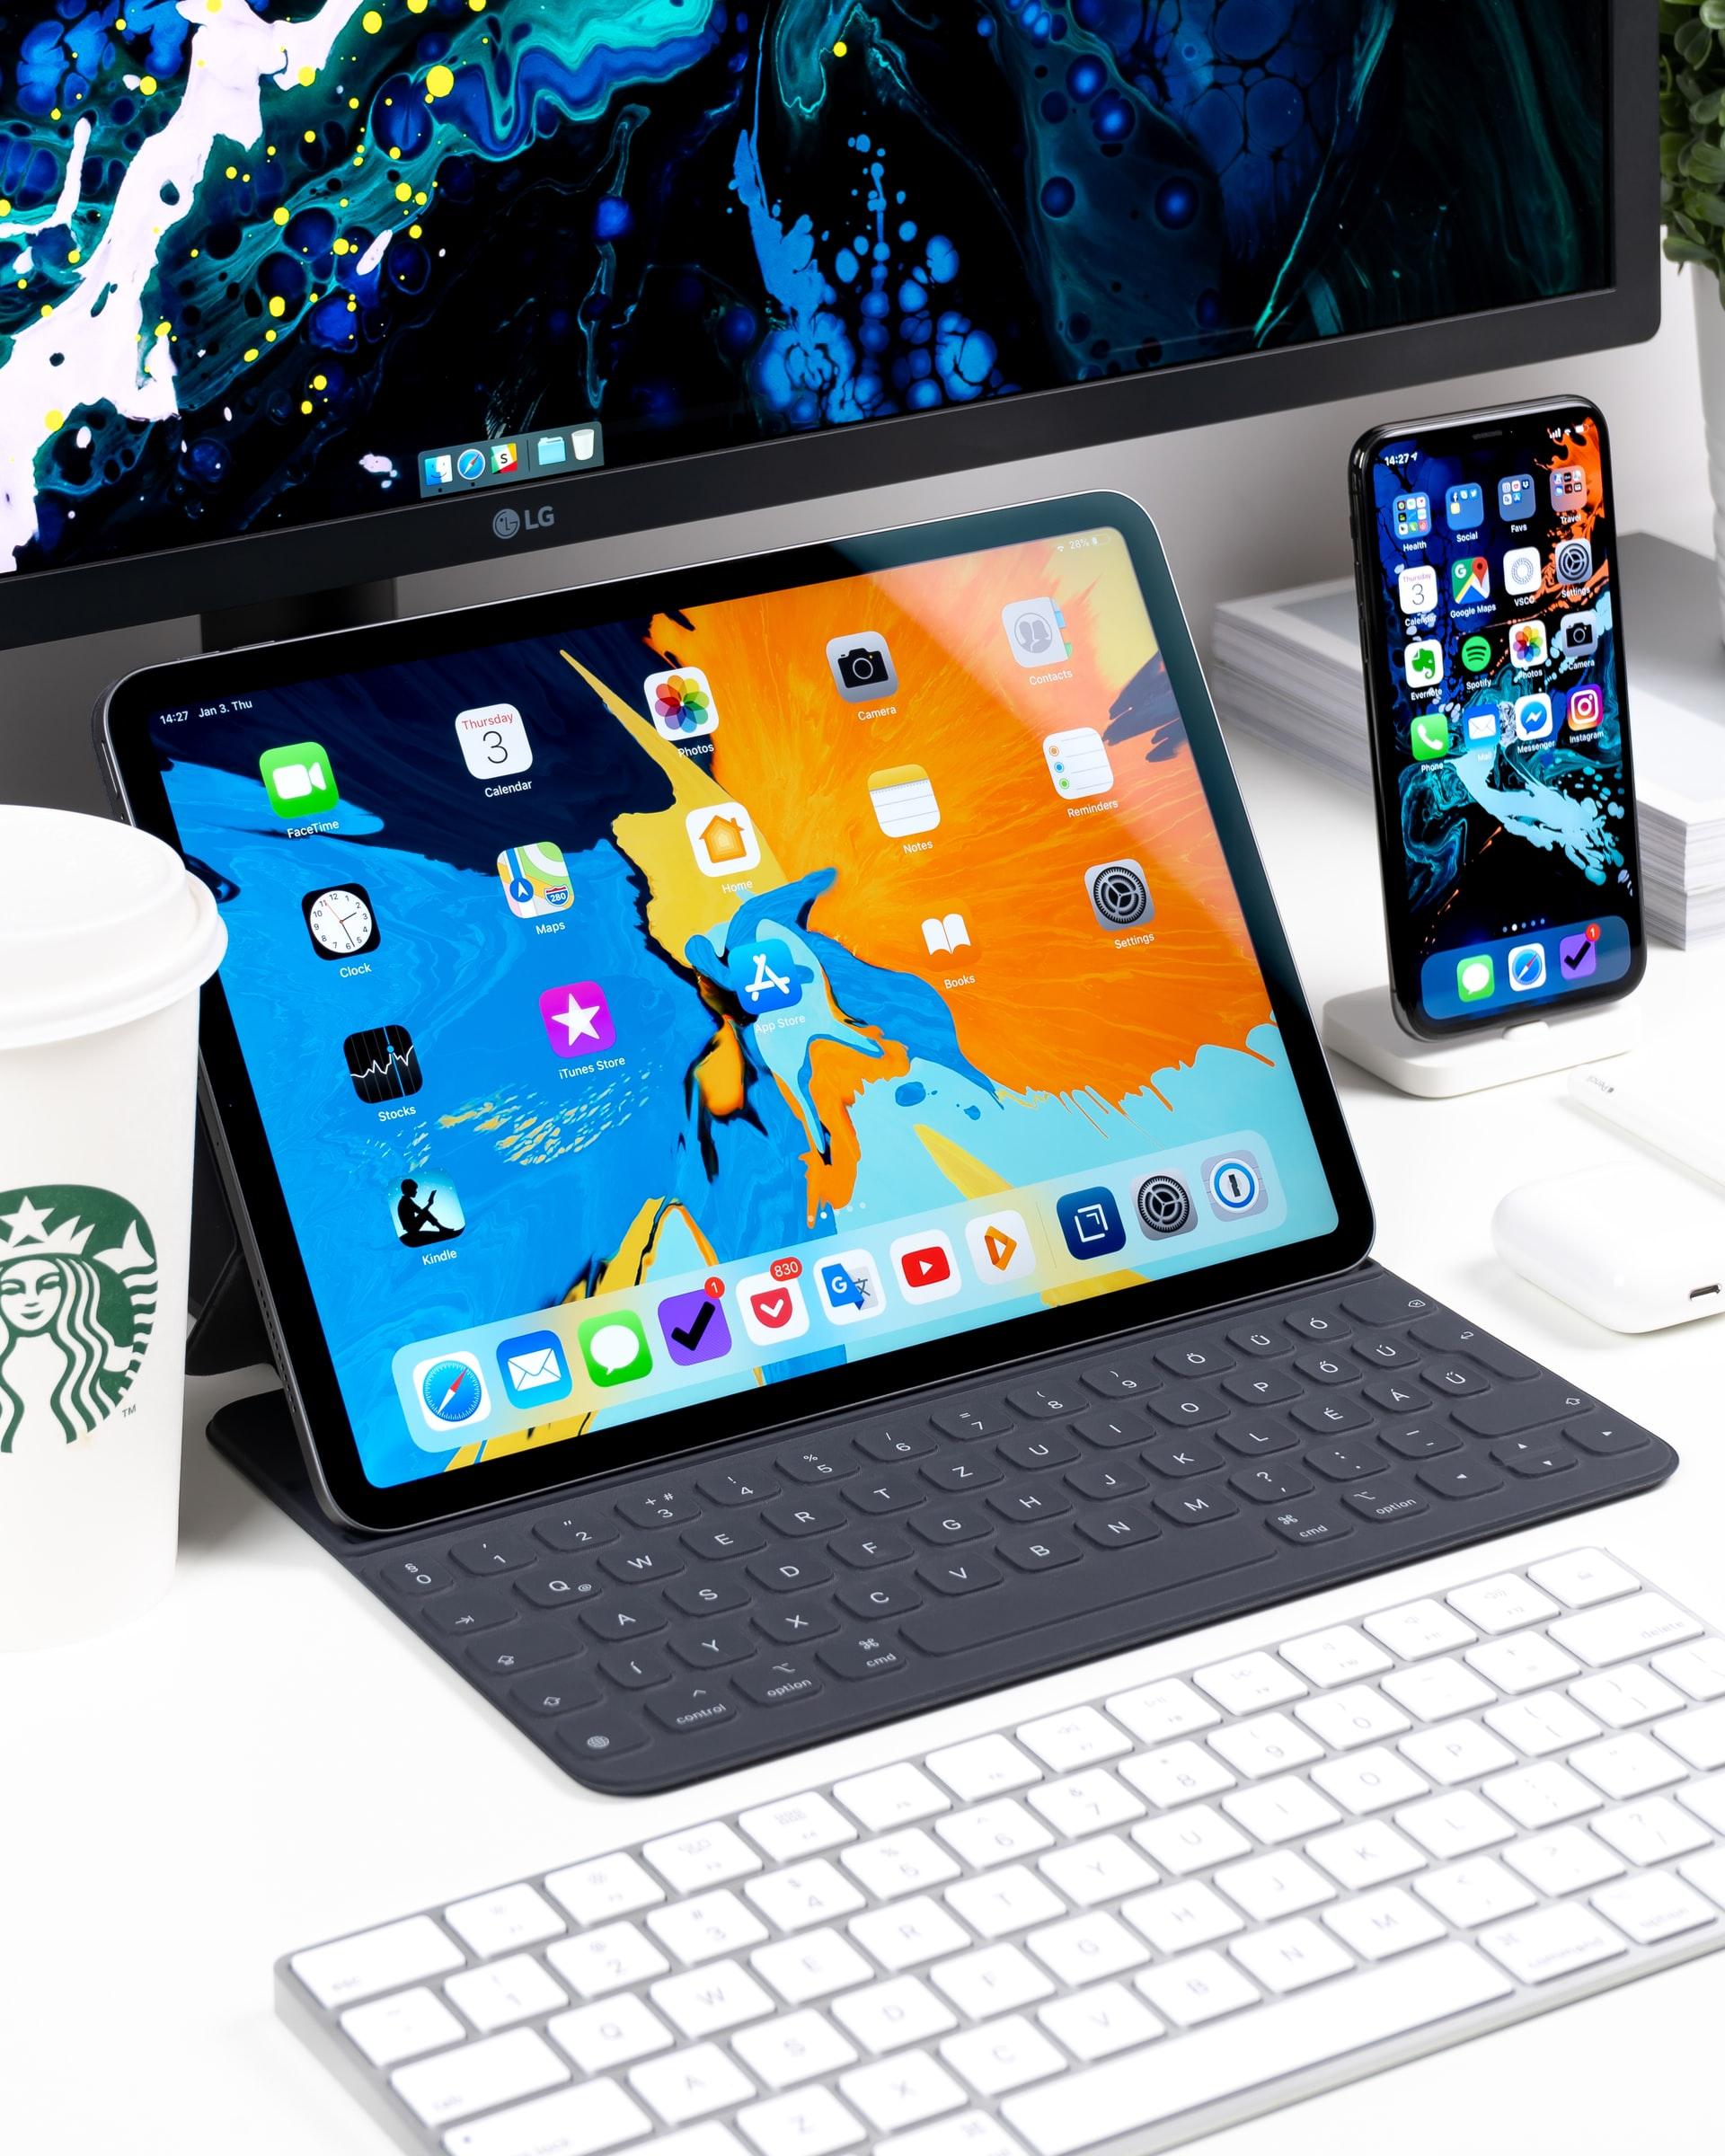 hotbit mobile/desktop app